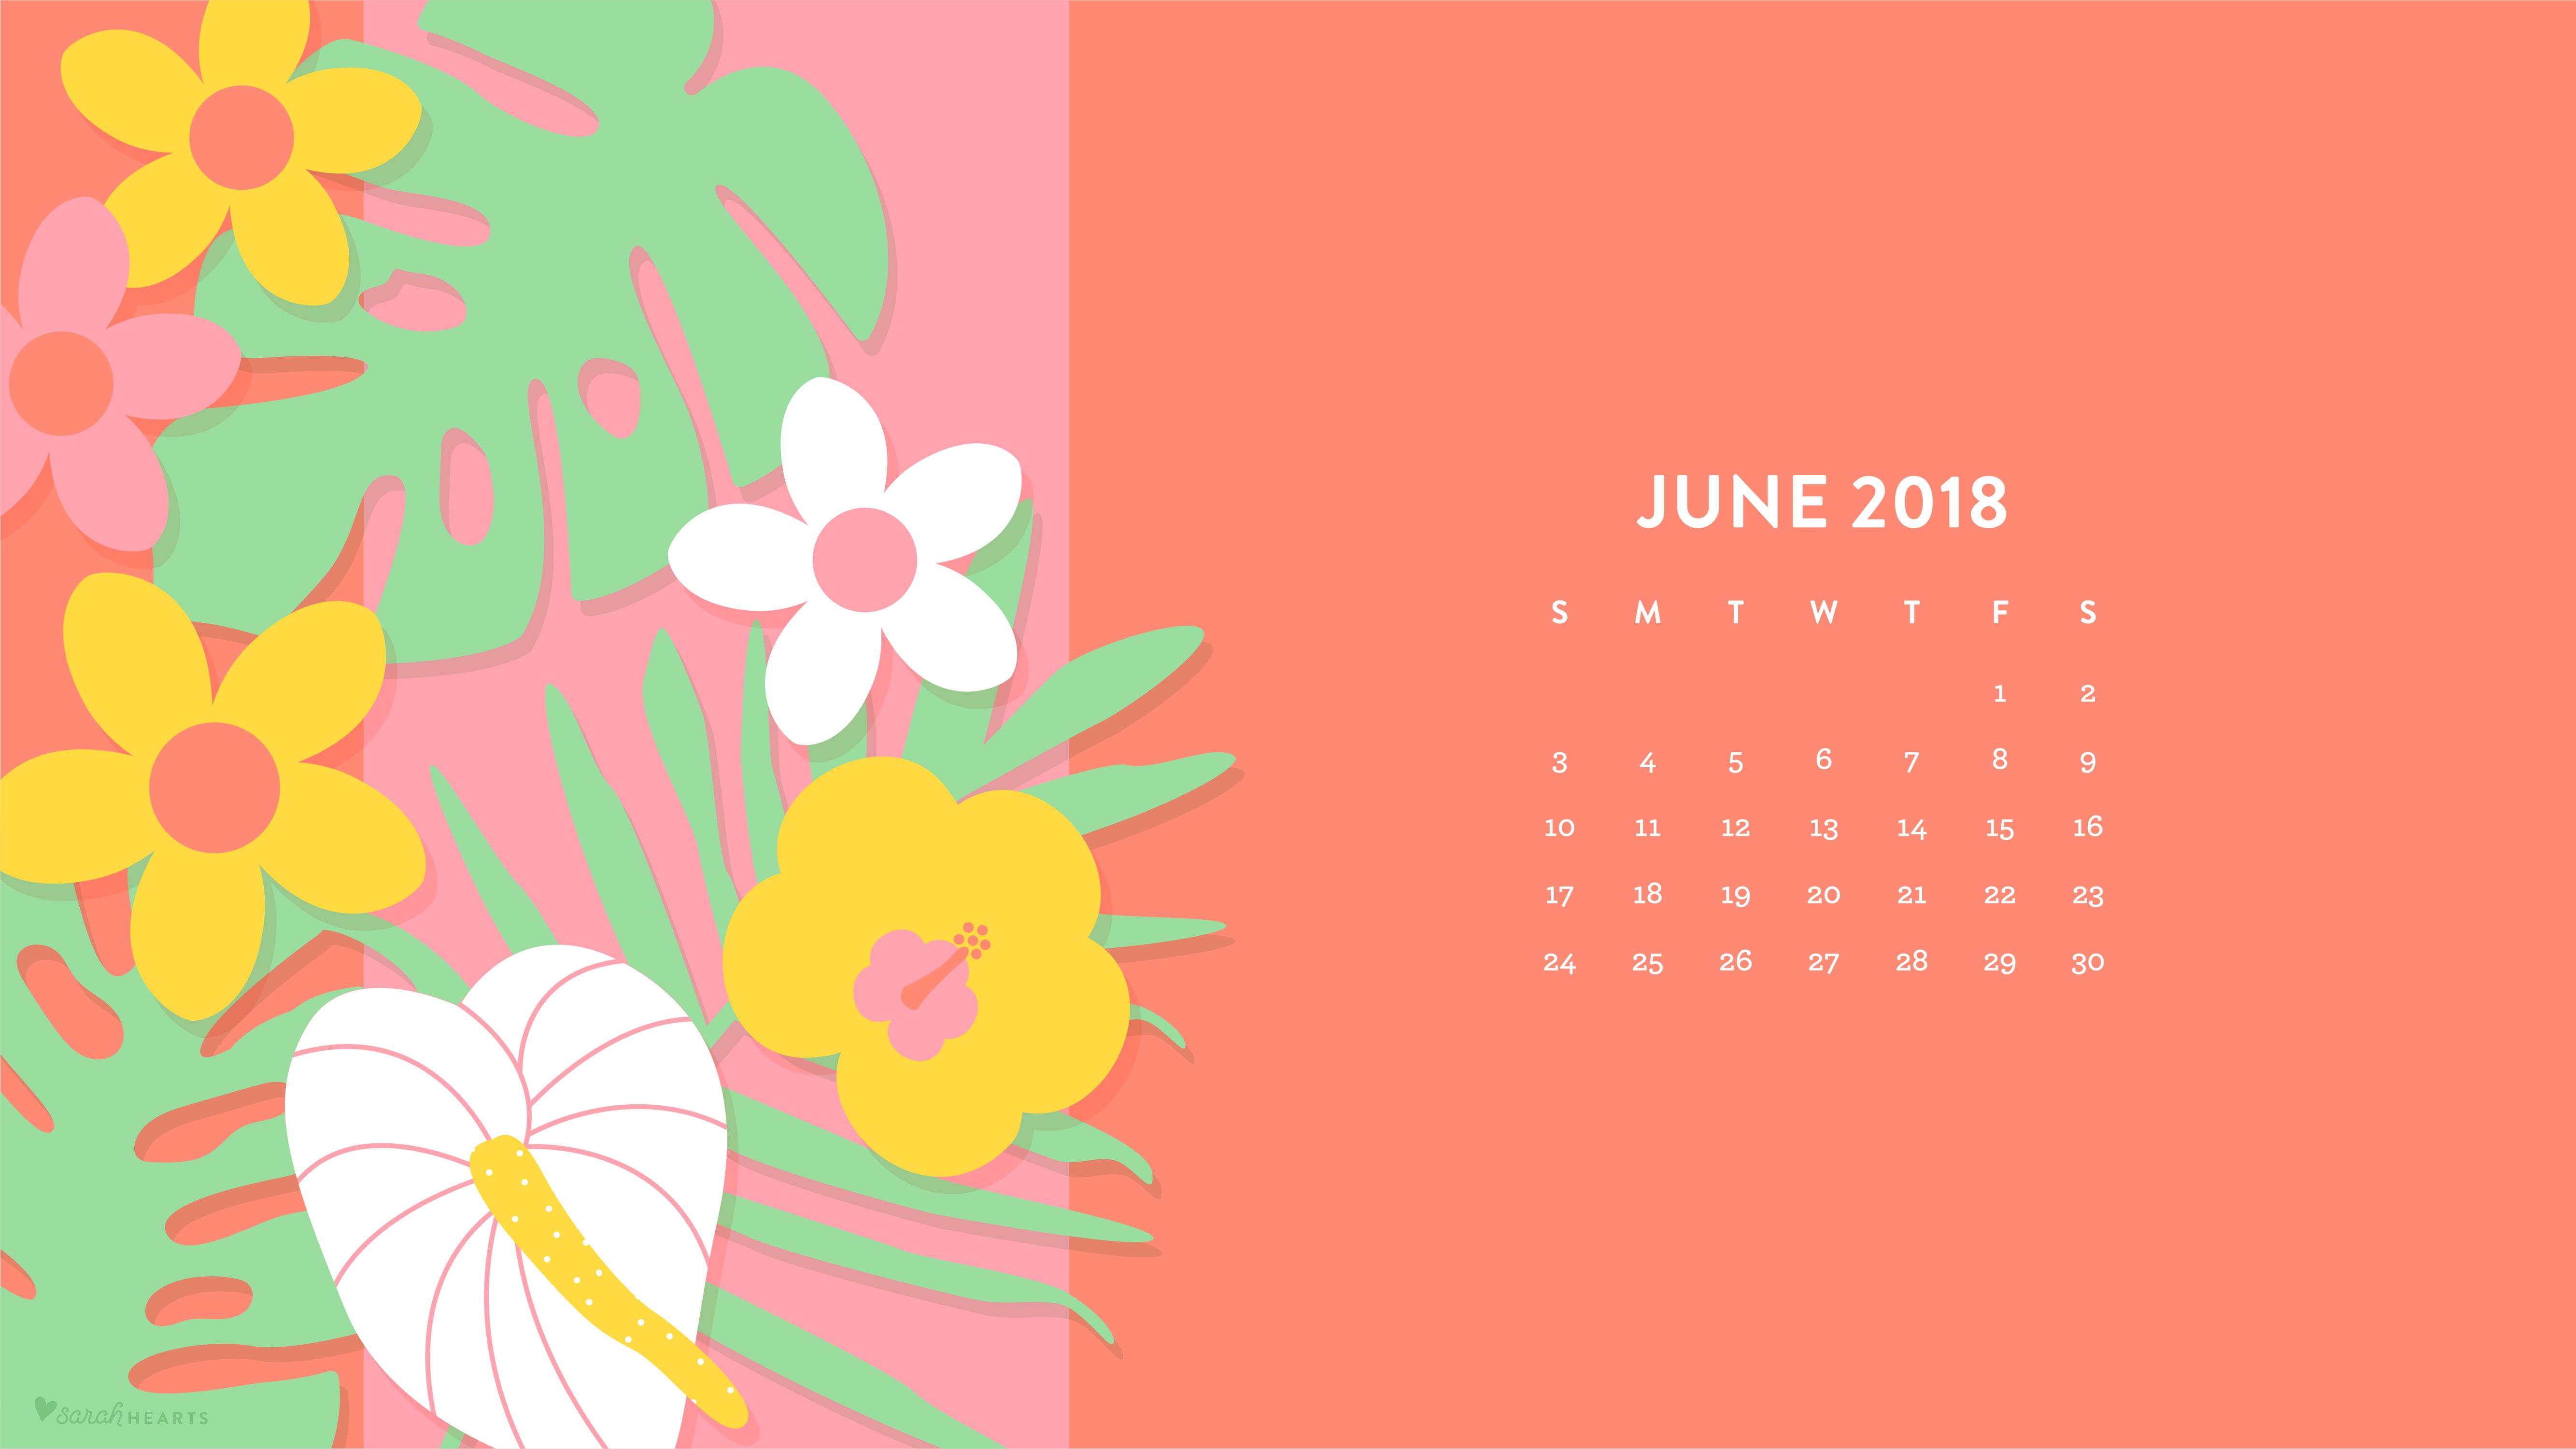 Watercolor Wallpaper Backgrounds Quote June 2018 Tropical Flowers Wallpaper Sarah Hearts